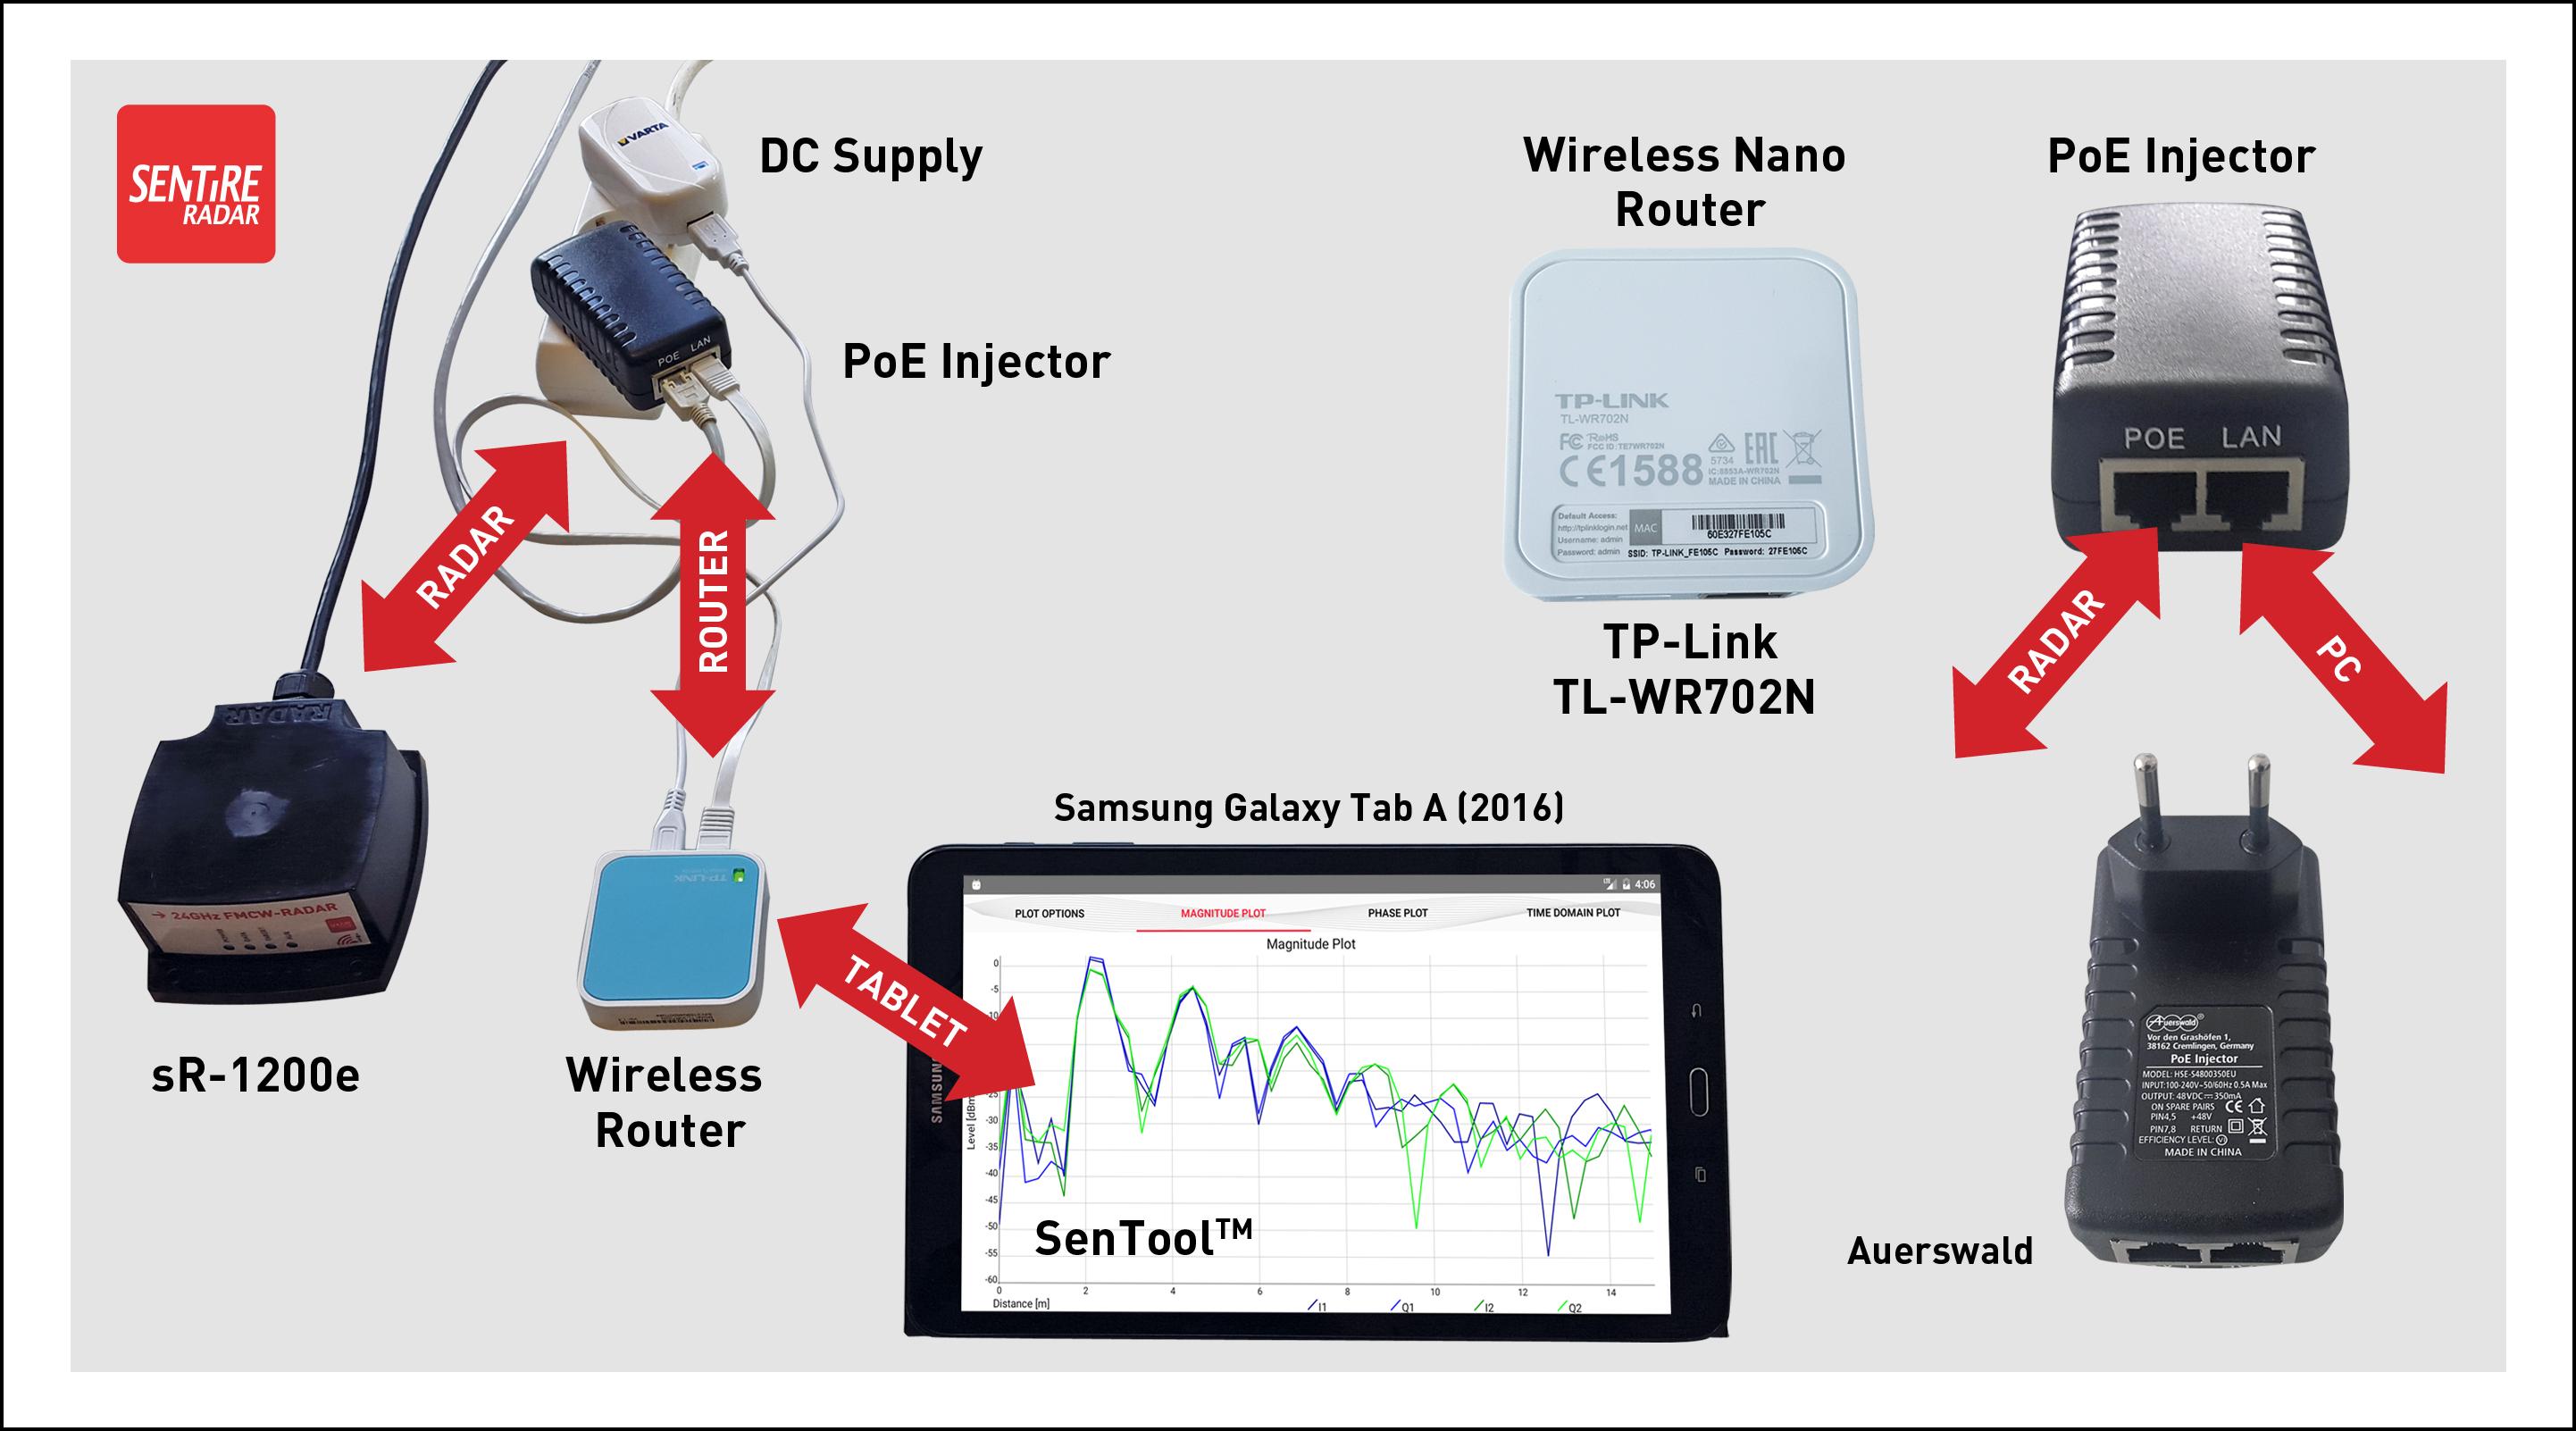 sR-1200e - 24 GHz FMCW Radar Module